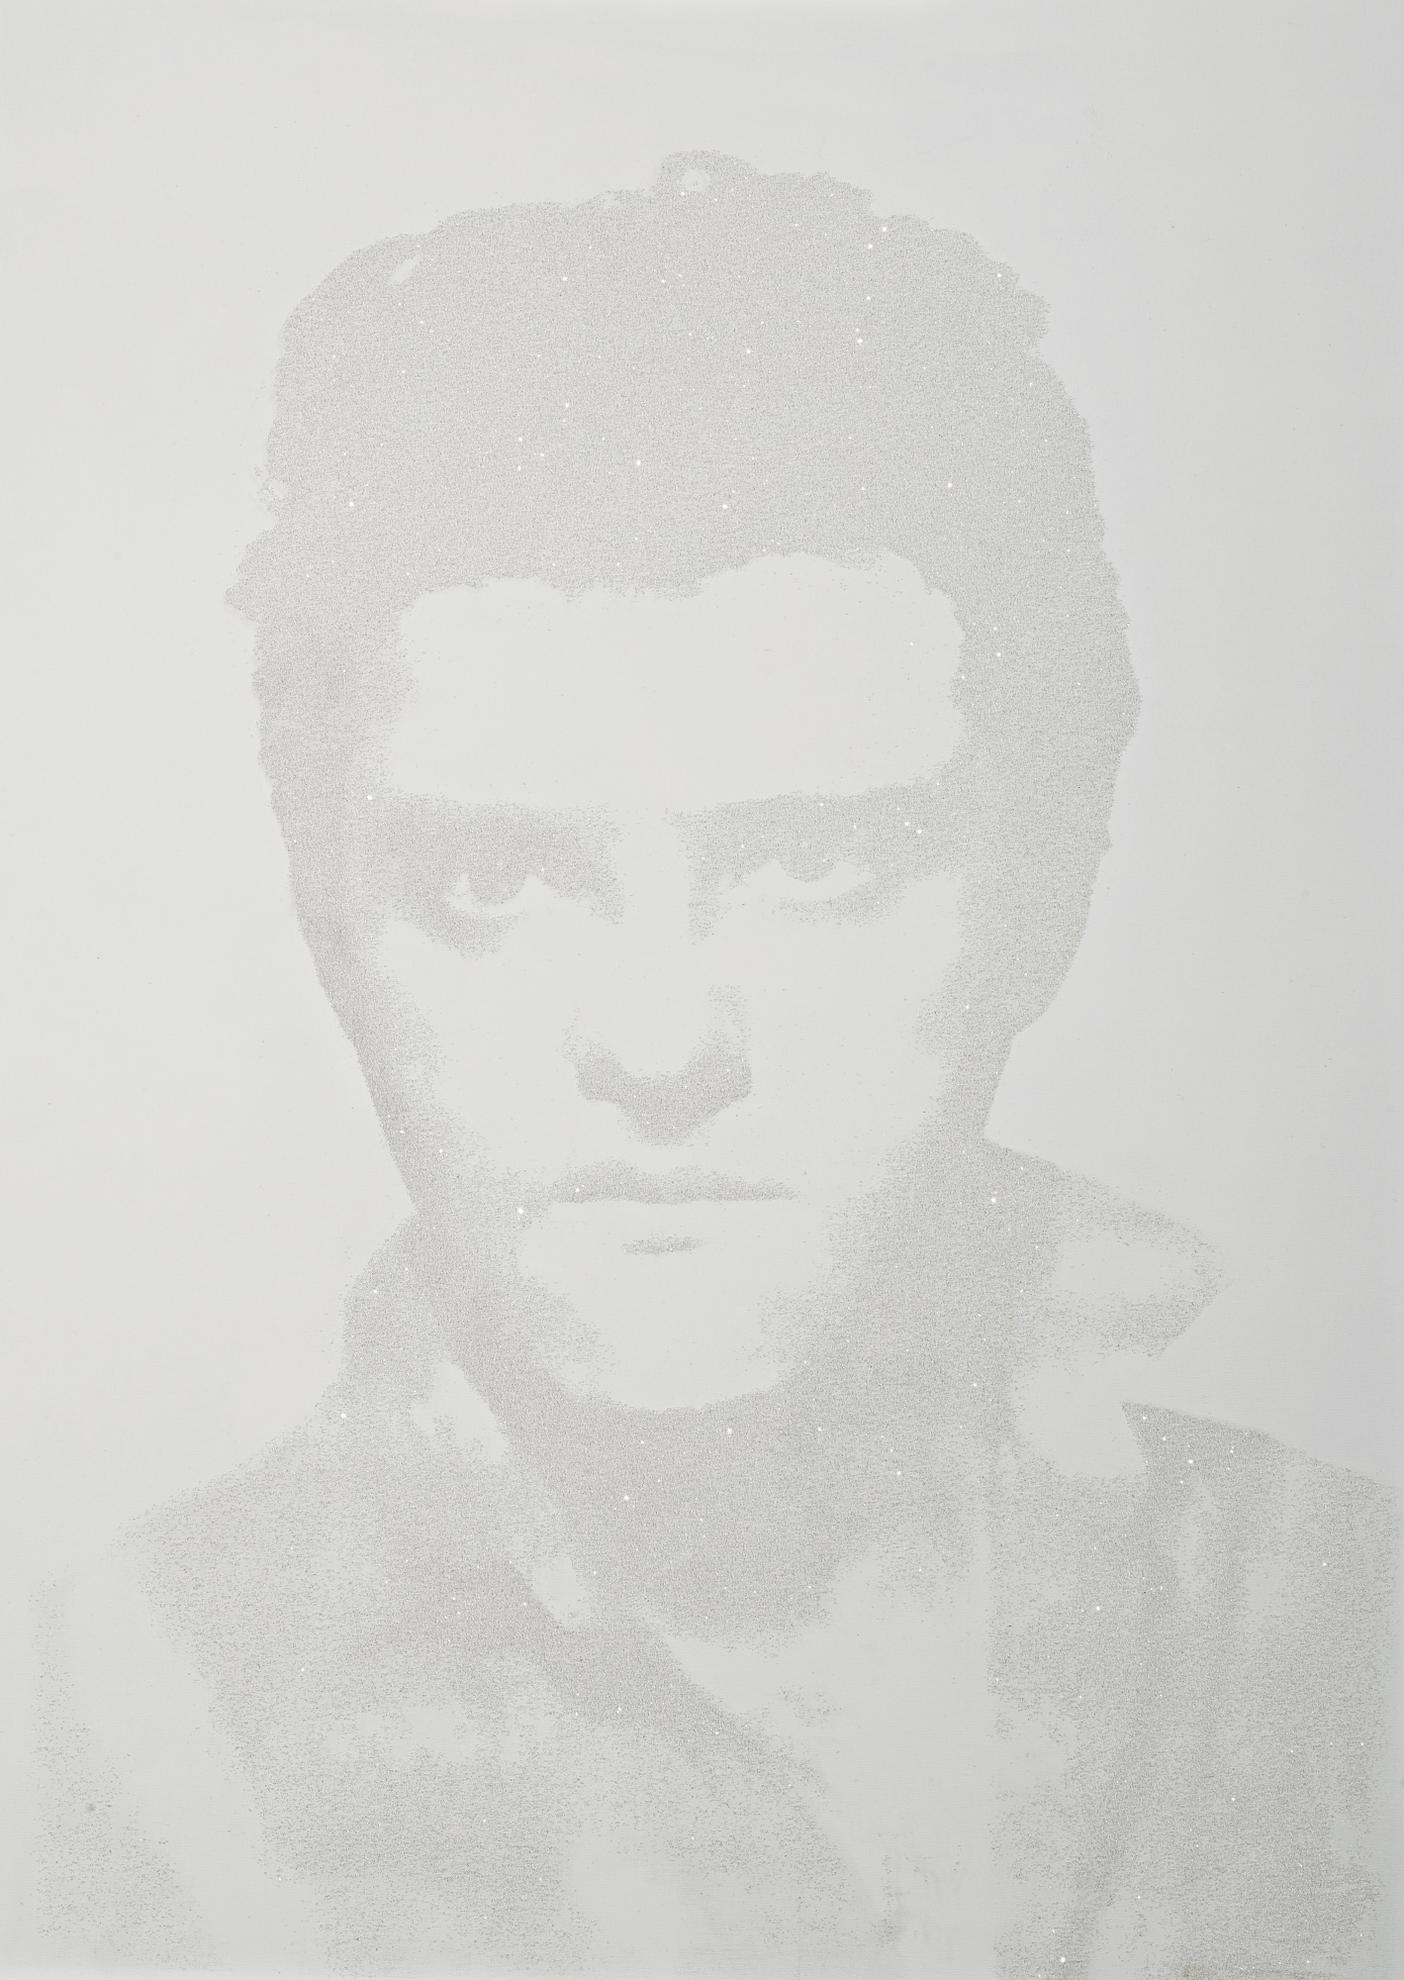 Gavin Turk-White Diamond Elvis-2007